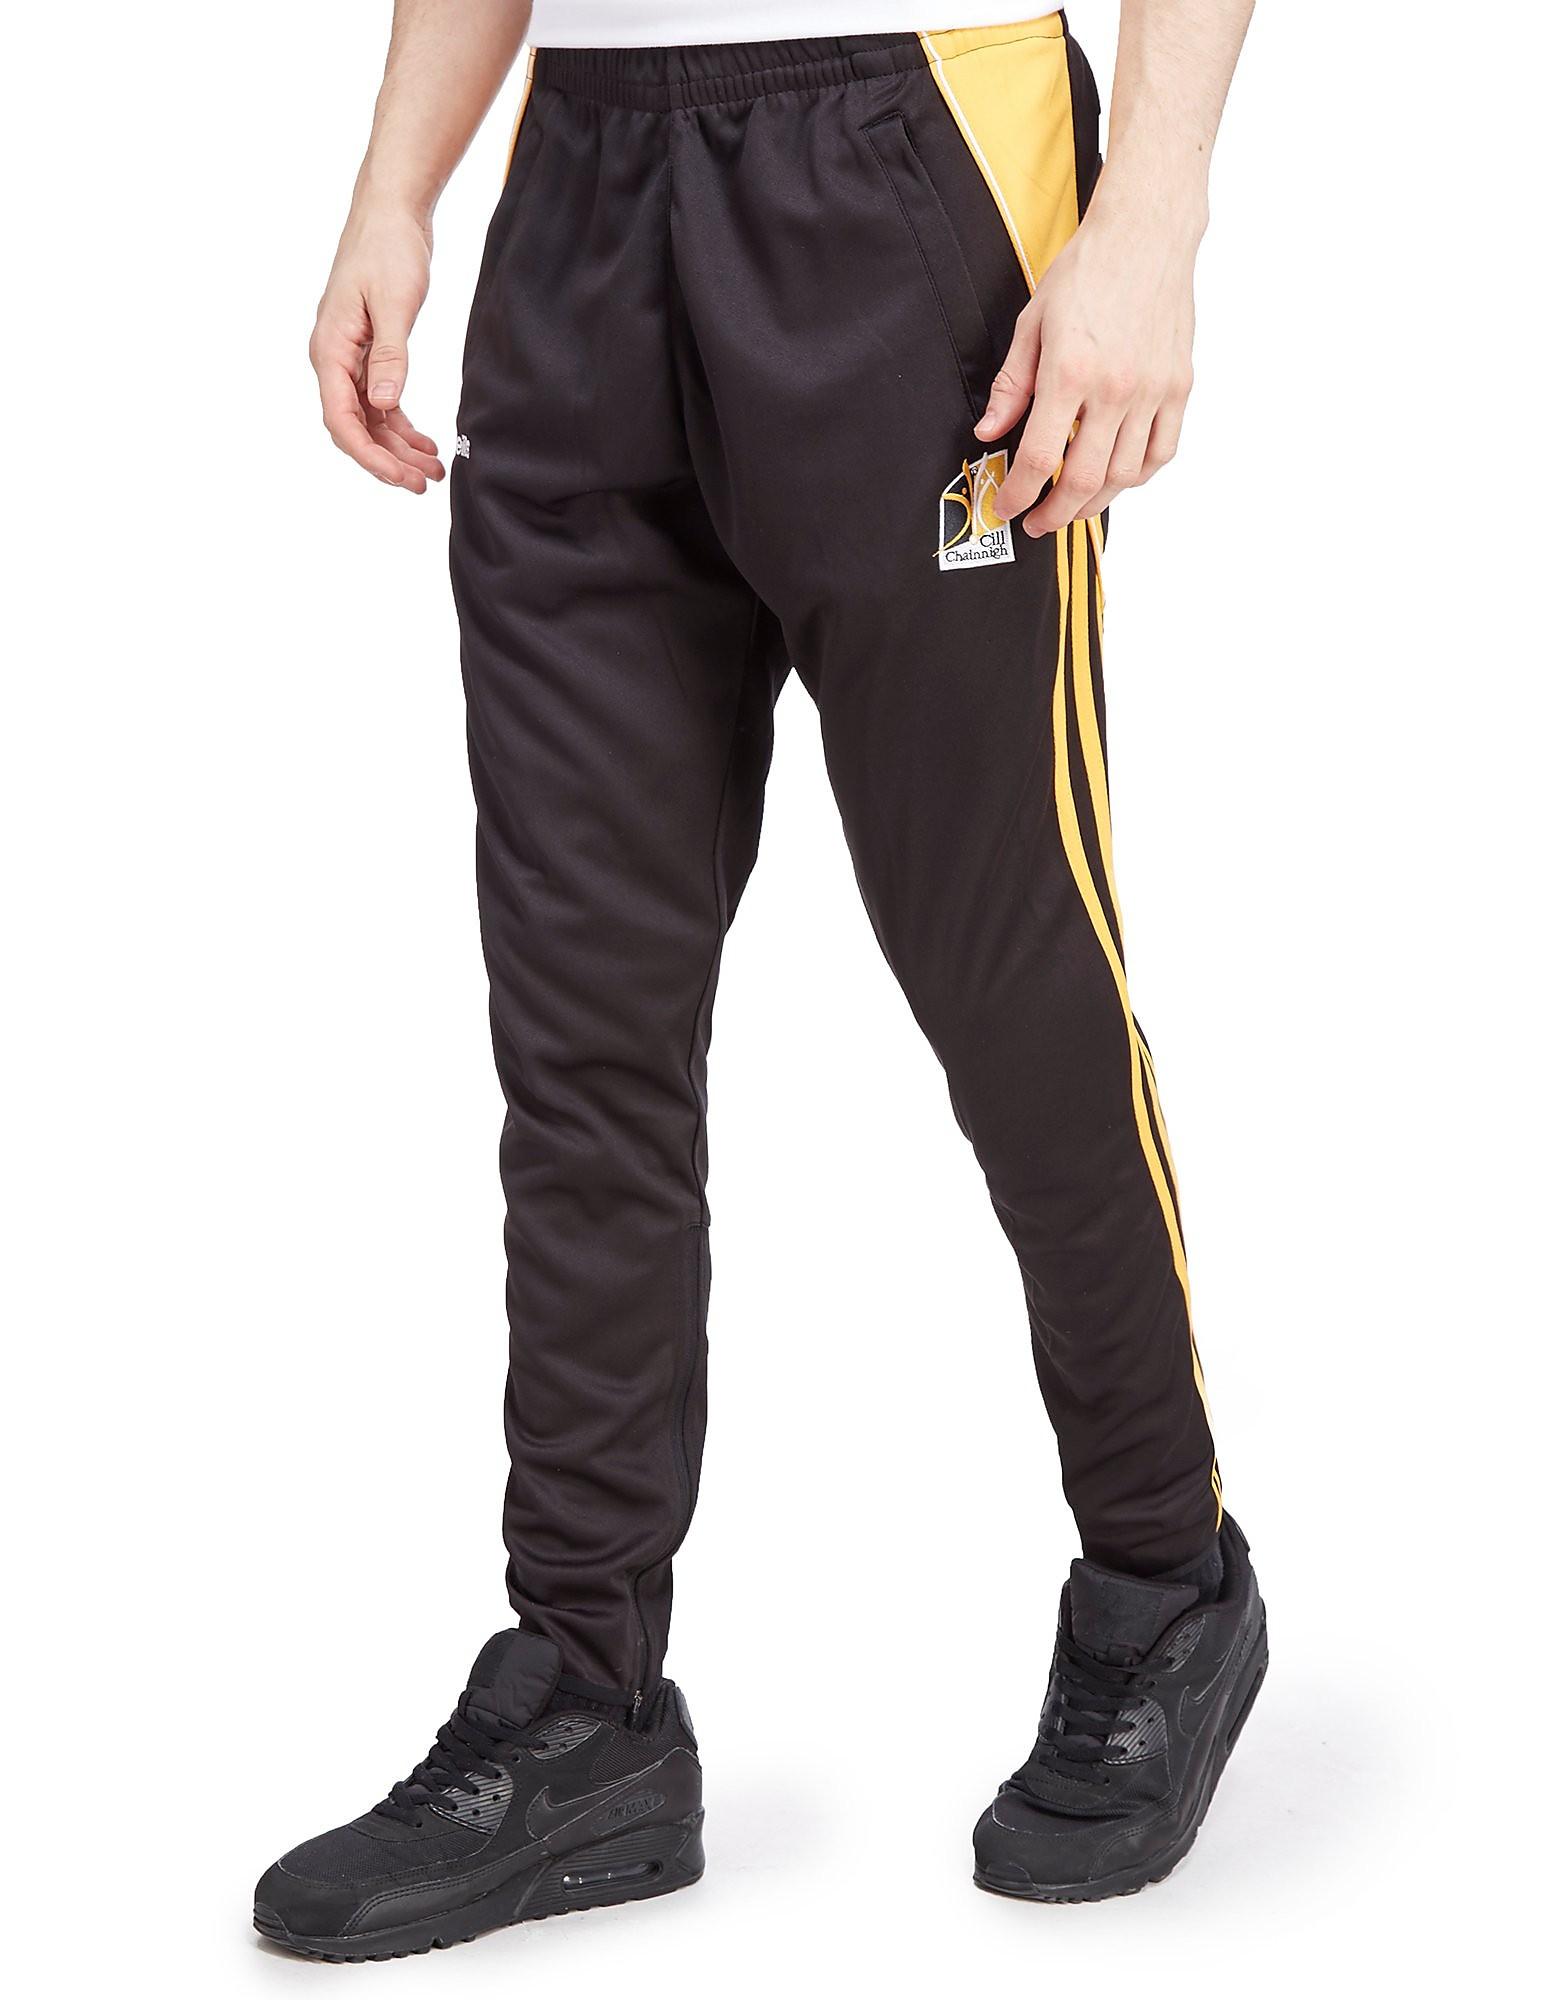 O'Neills Kilkenny Slim Jogging Pants